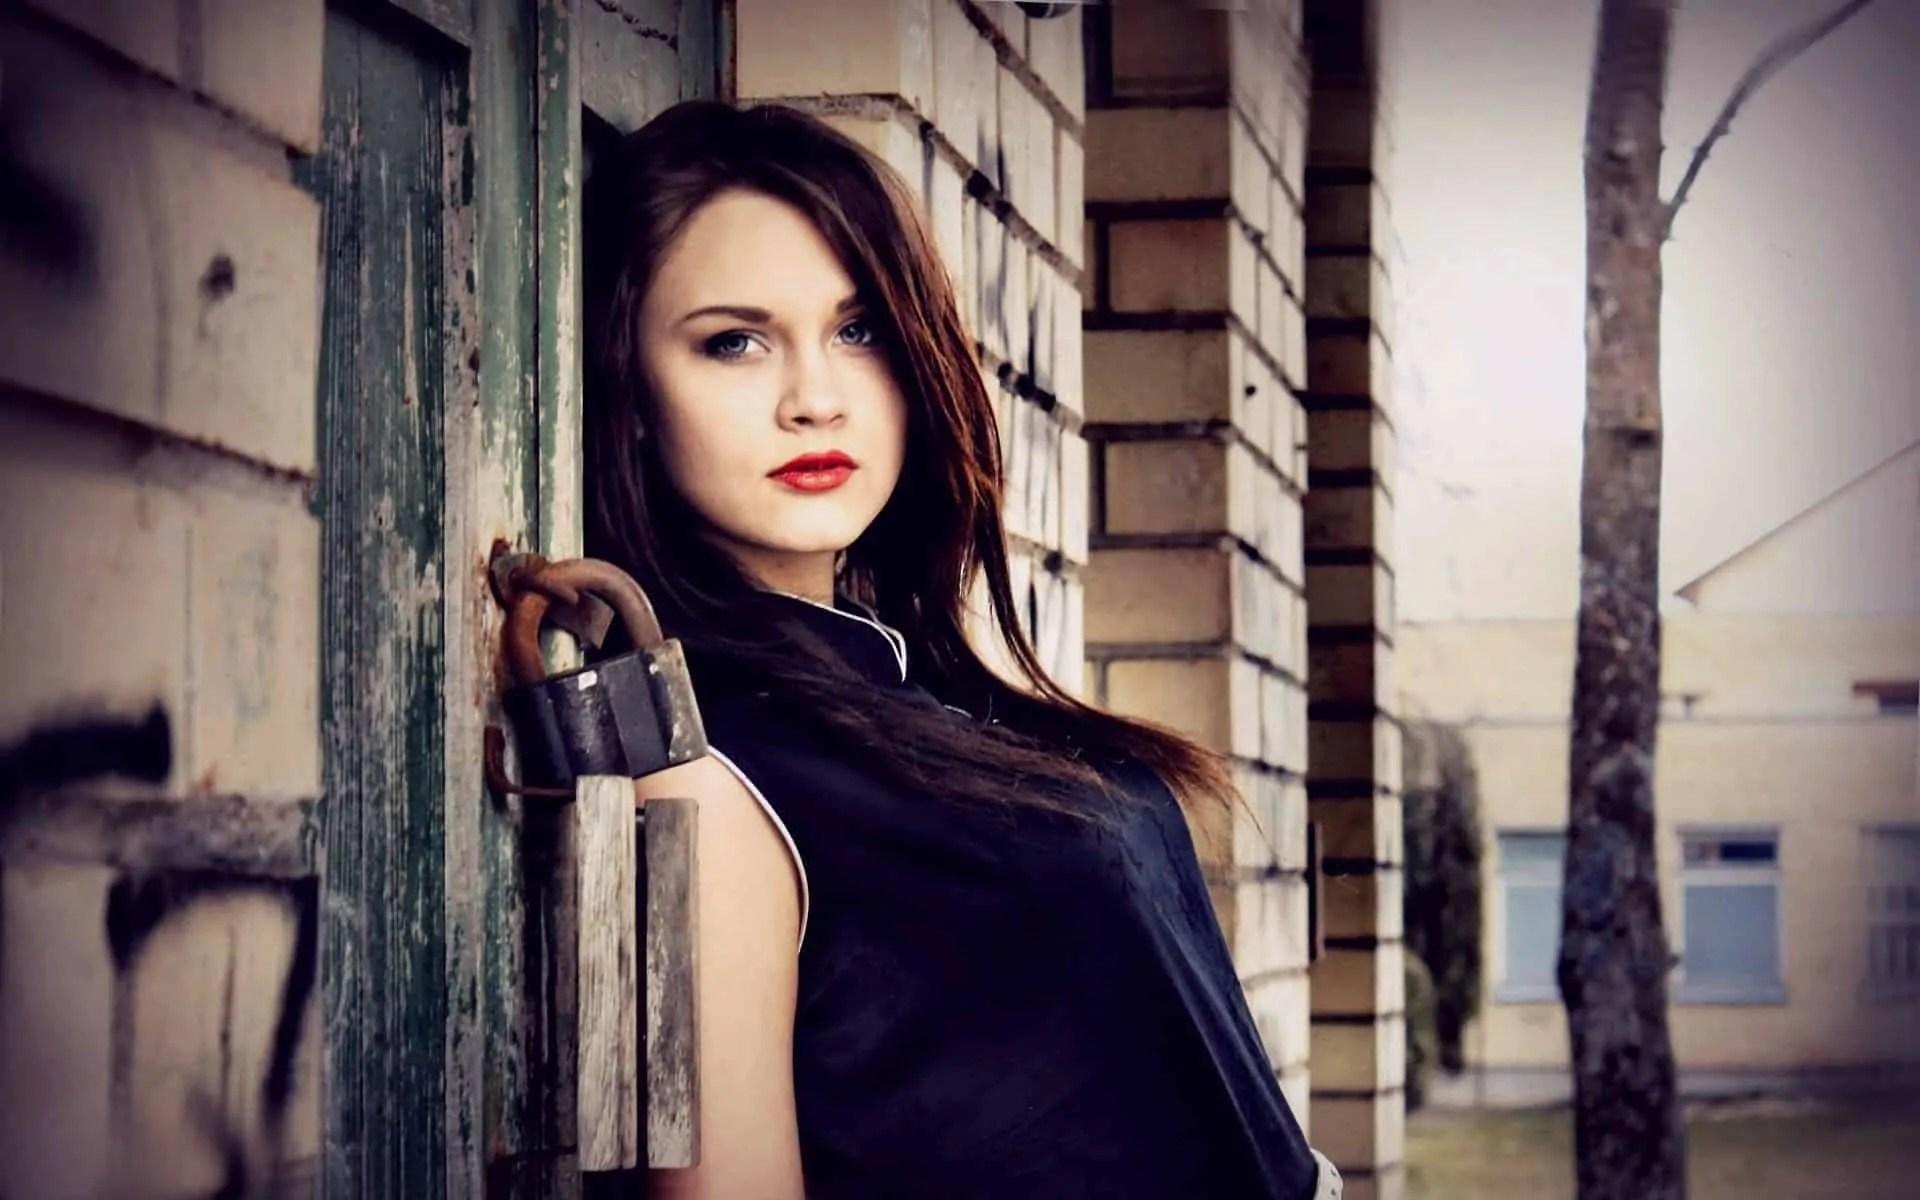 7012343-building-fashion-girl-model-photo (1) 5